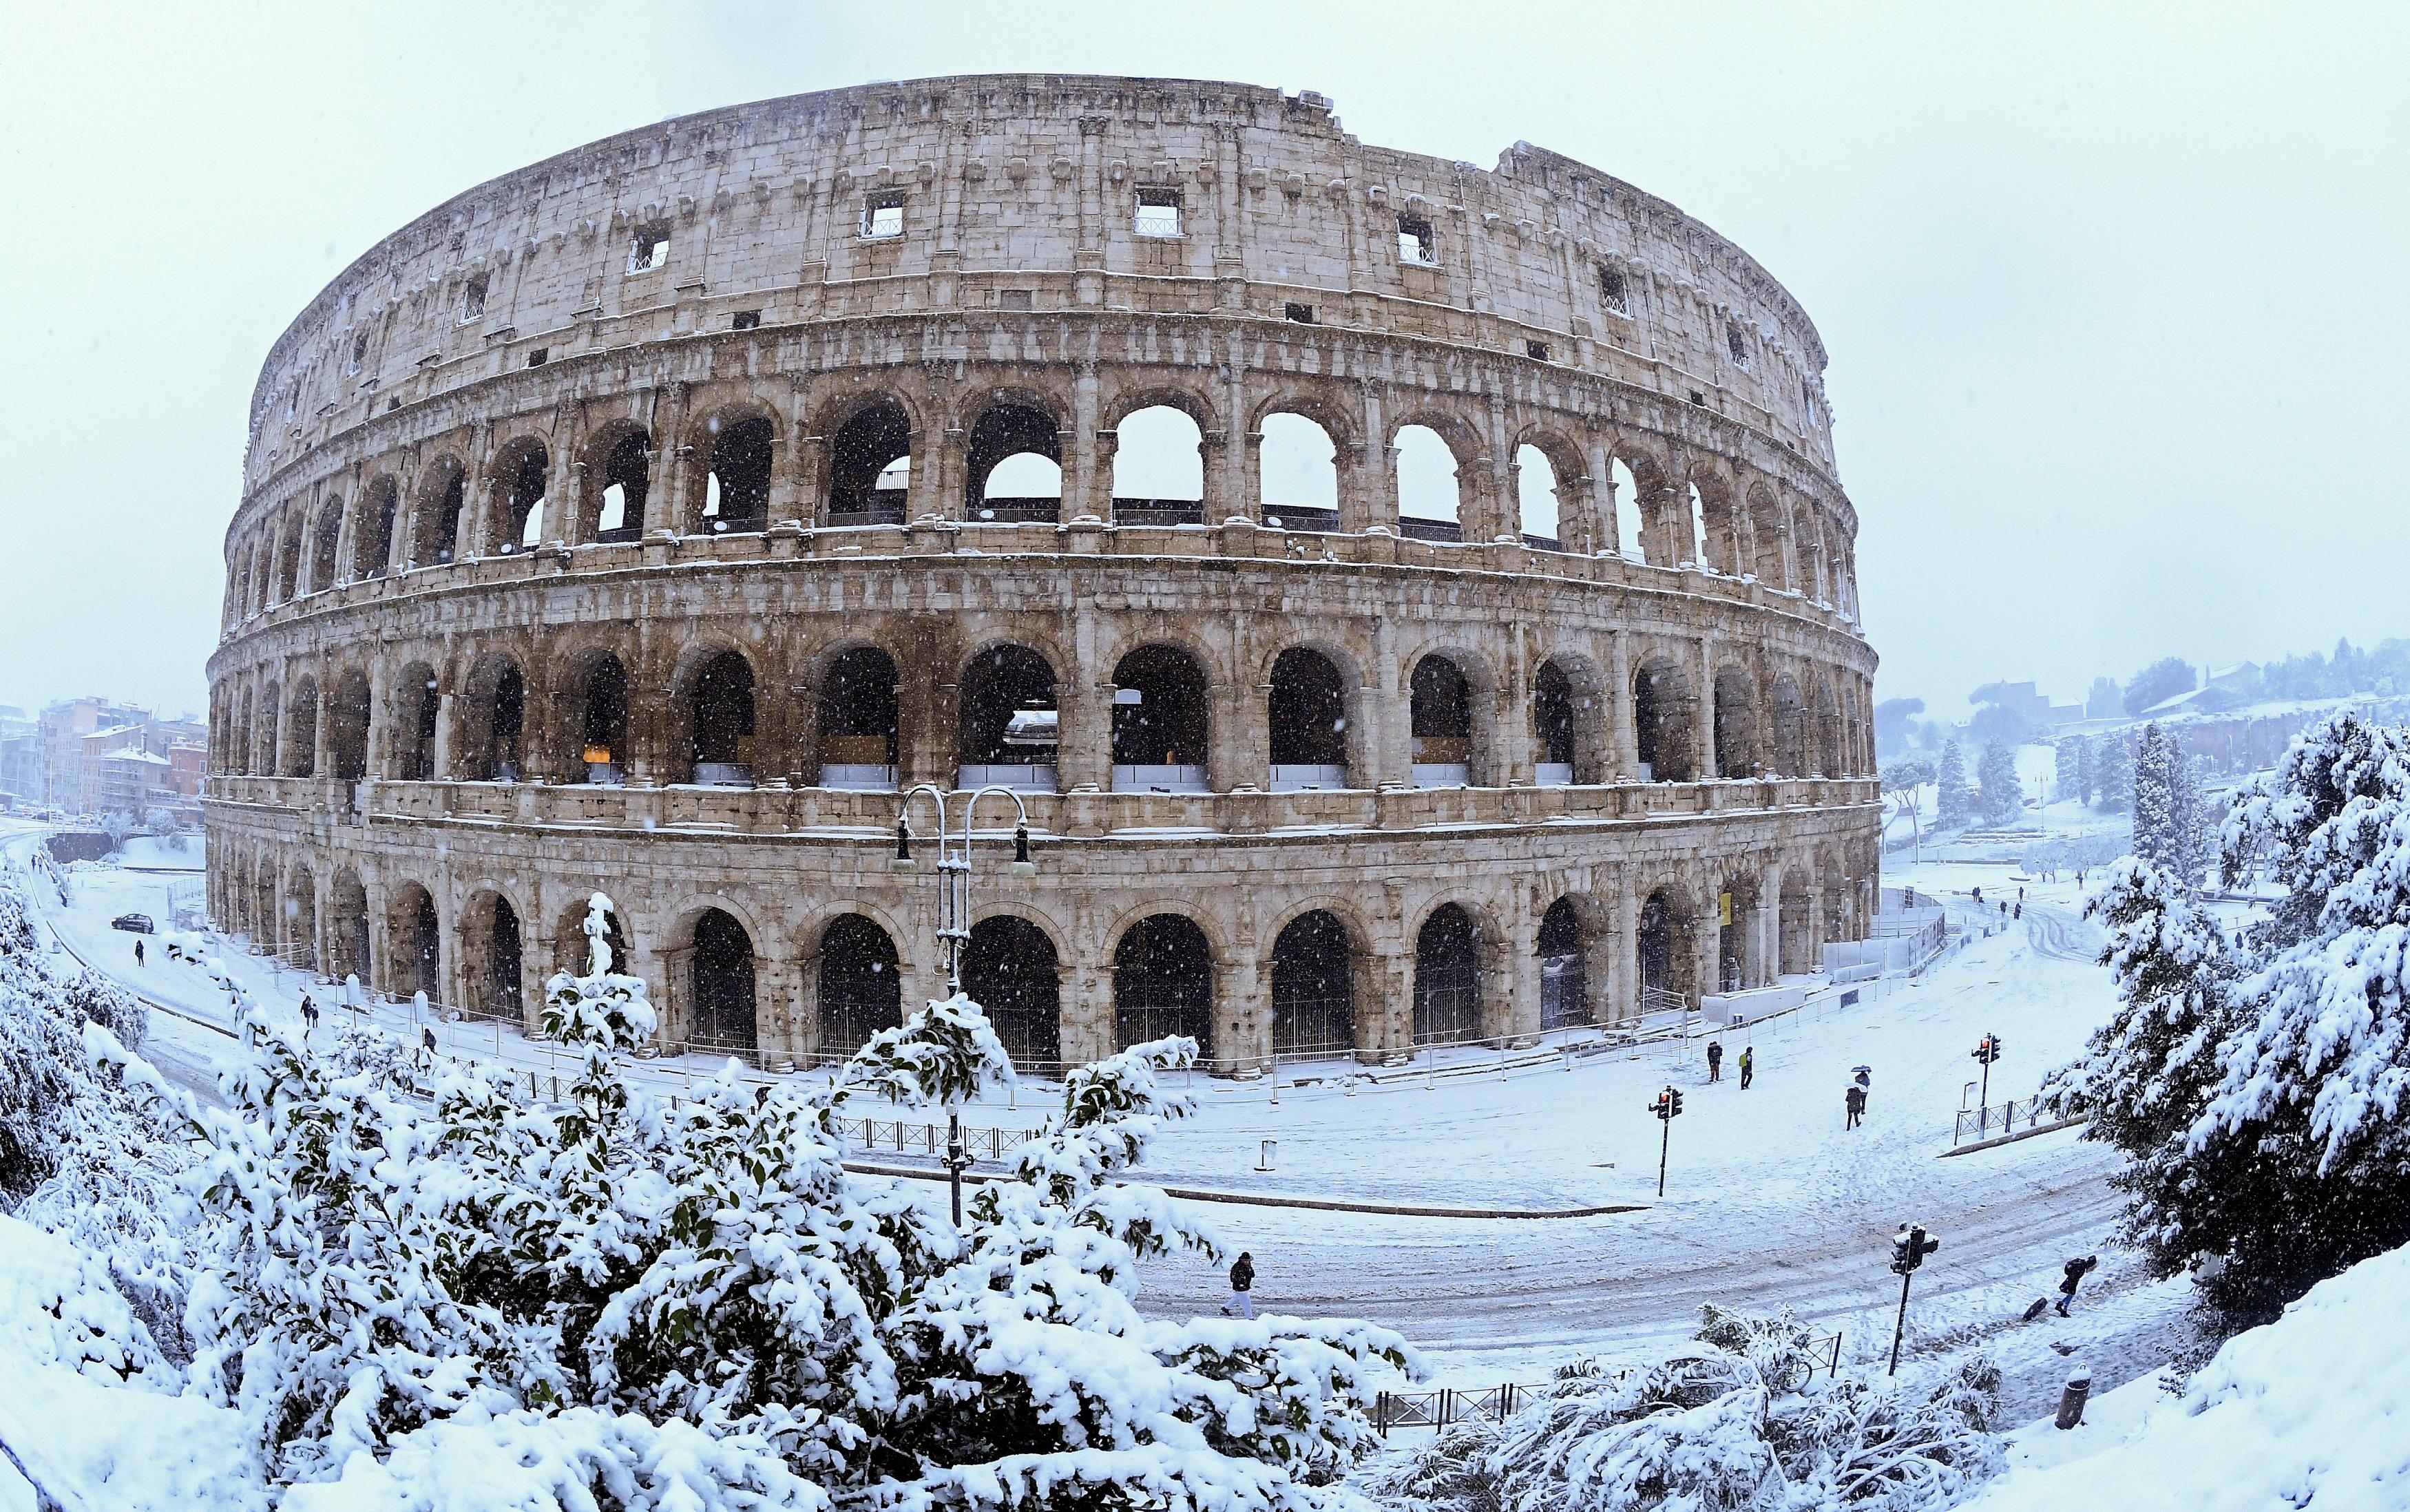 El Coliseo en Roma (REUTERS/Alberto Lingria)